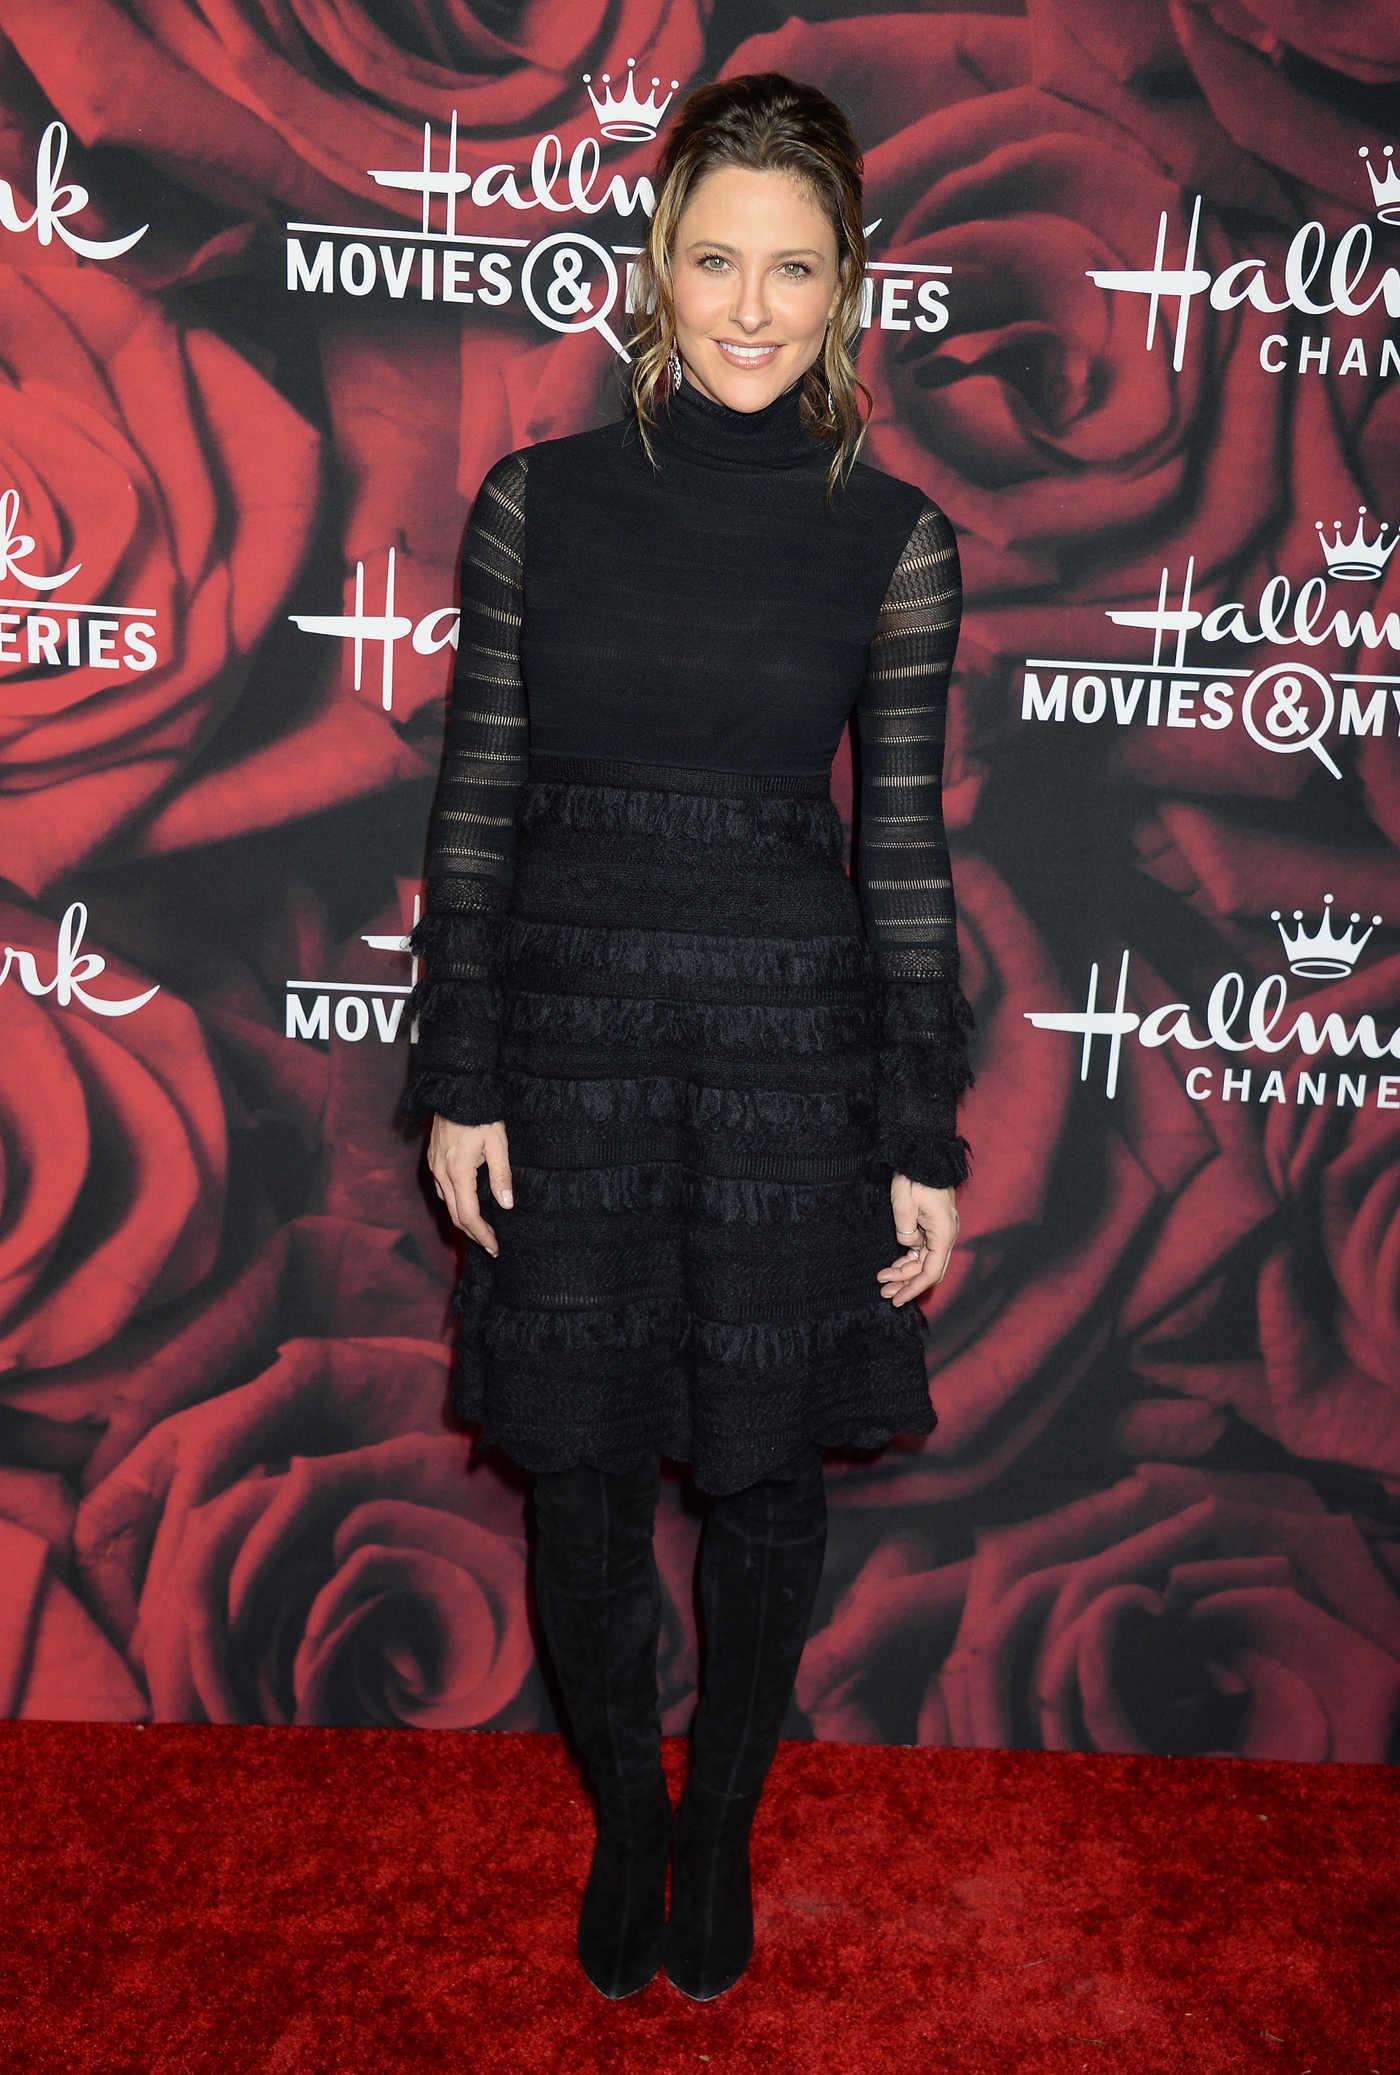 Jill Wagner at the Hallmark Channel TCA Winter Press Tour in Pasadena 01/14/2017